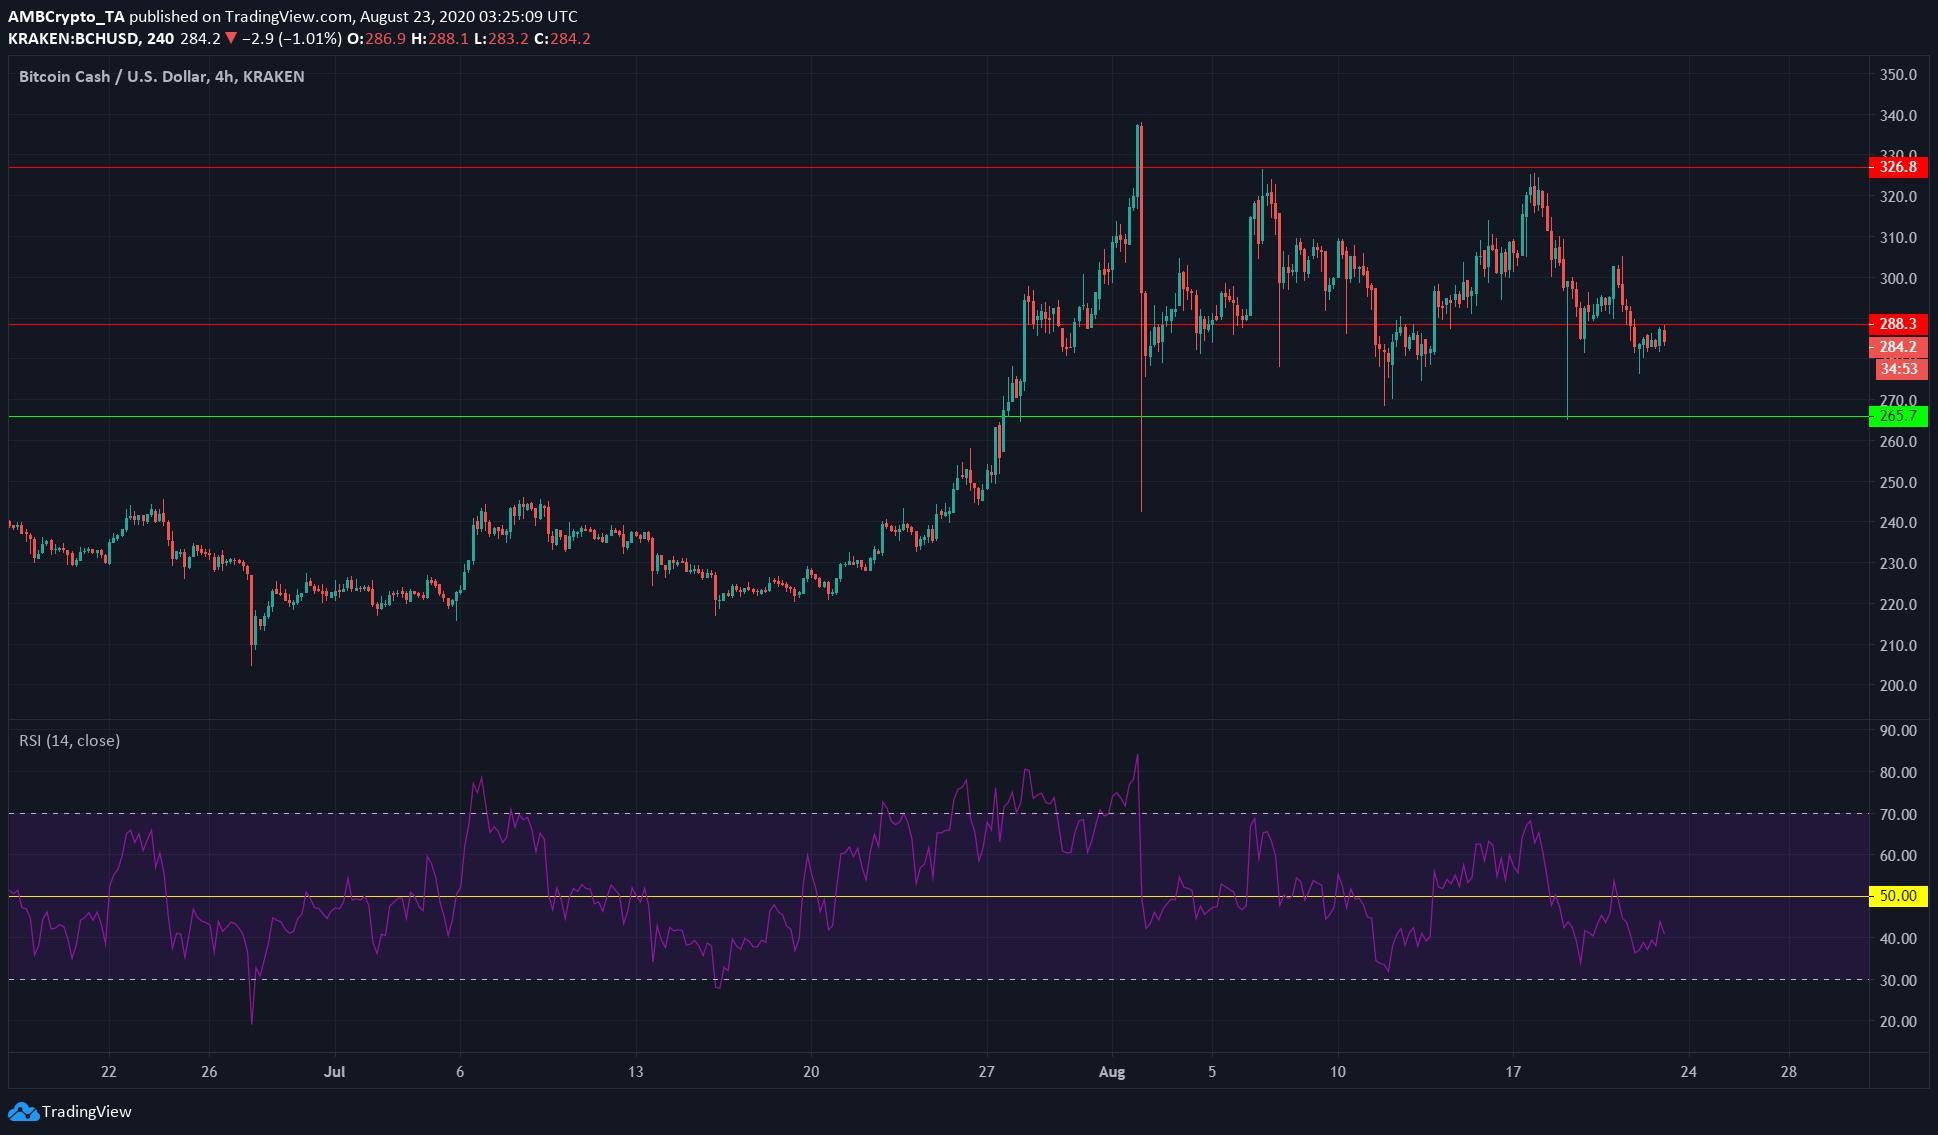 VeChain, Crypto.com, Bitcoin Cash Price Analysis: 23 August